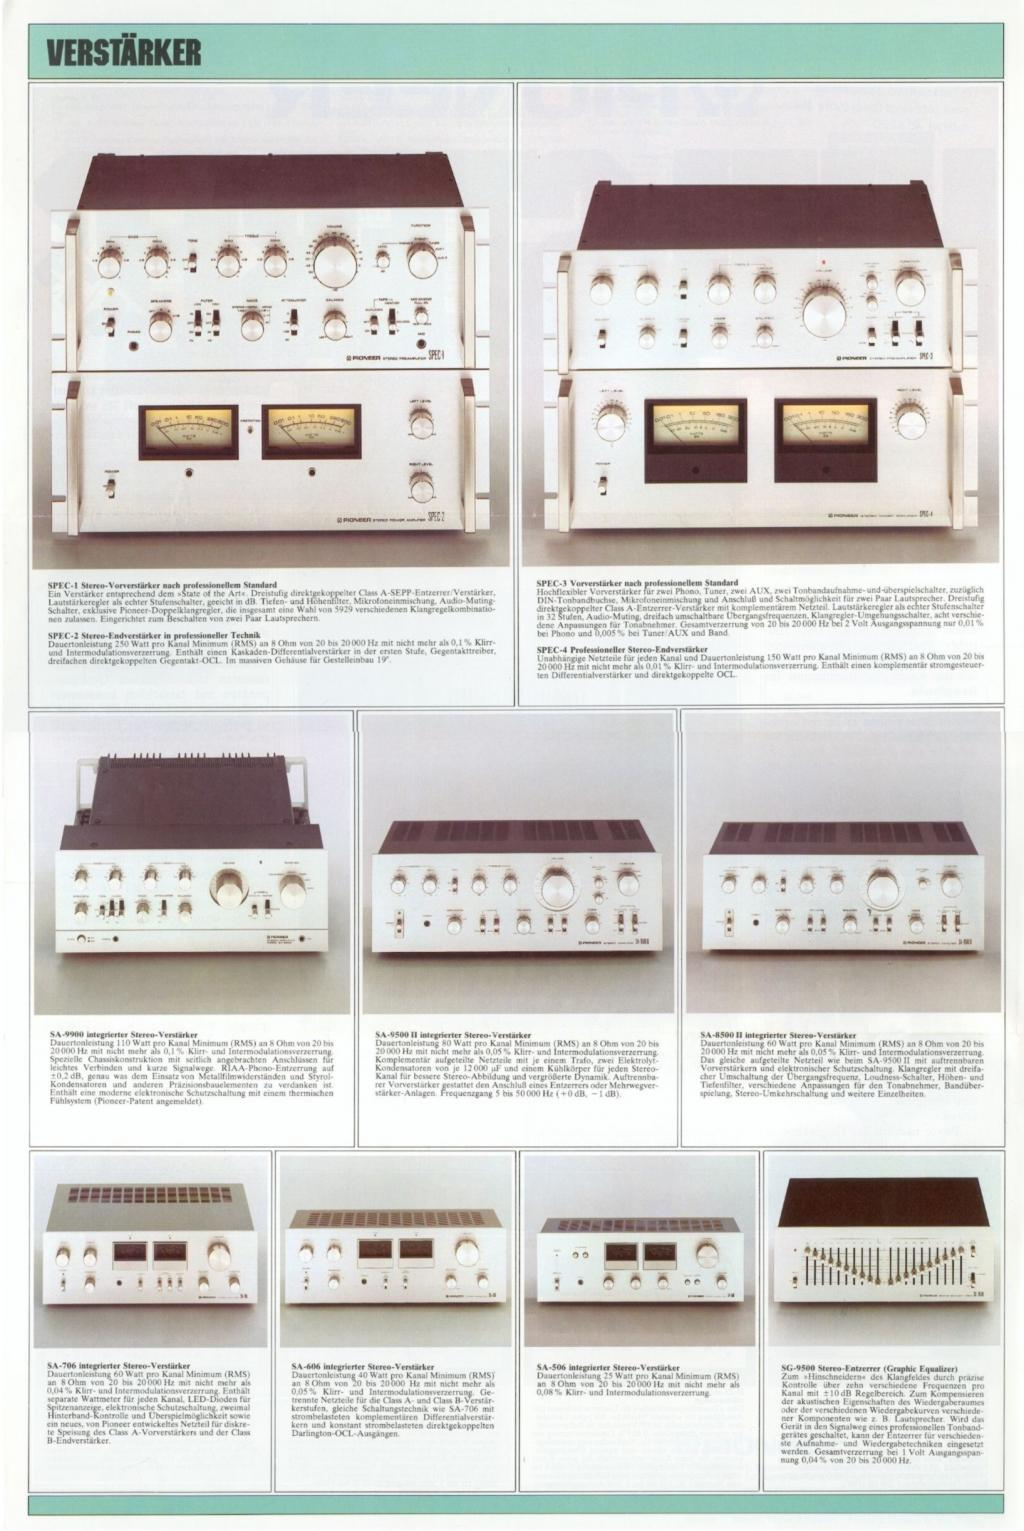 GUERRA CIVIL JAPONESA DEL AUDIO (70,s 80,s) - Página 13 Pioneer78-02-10b2980